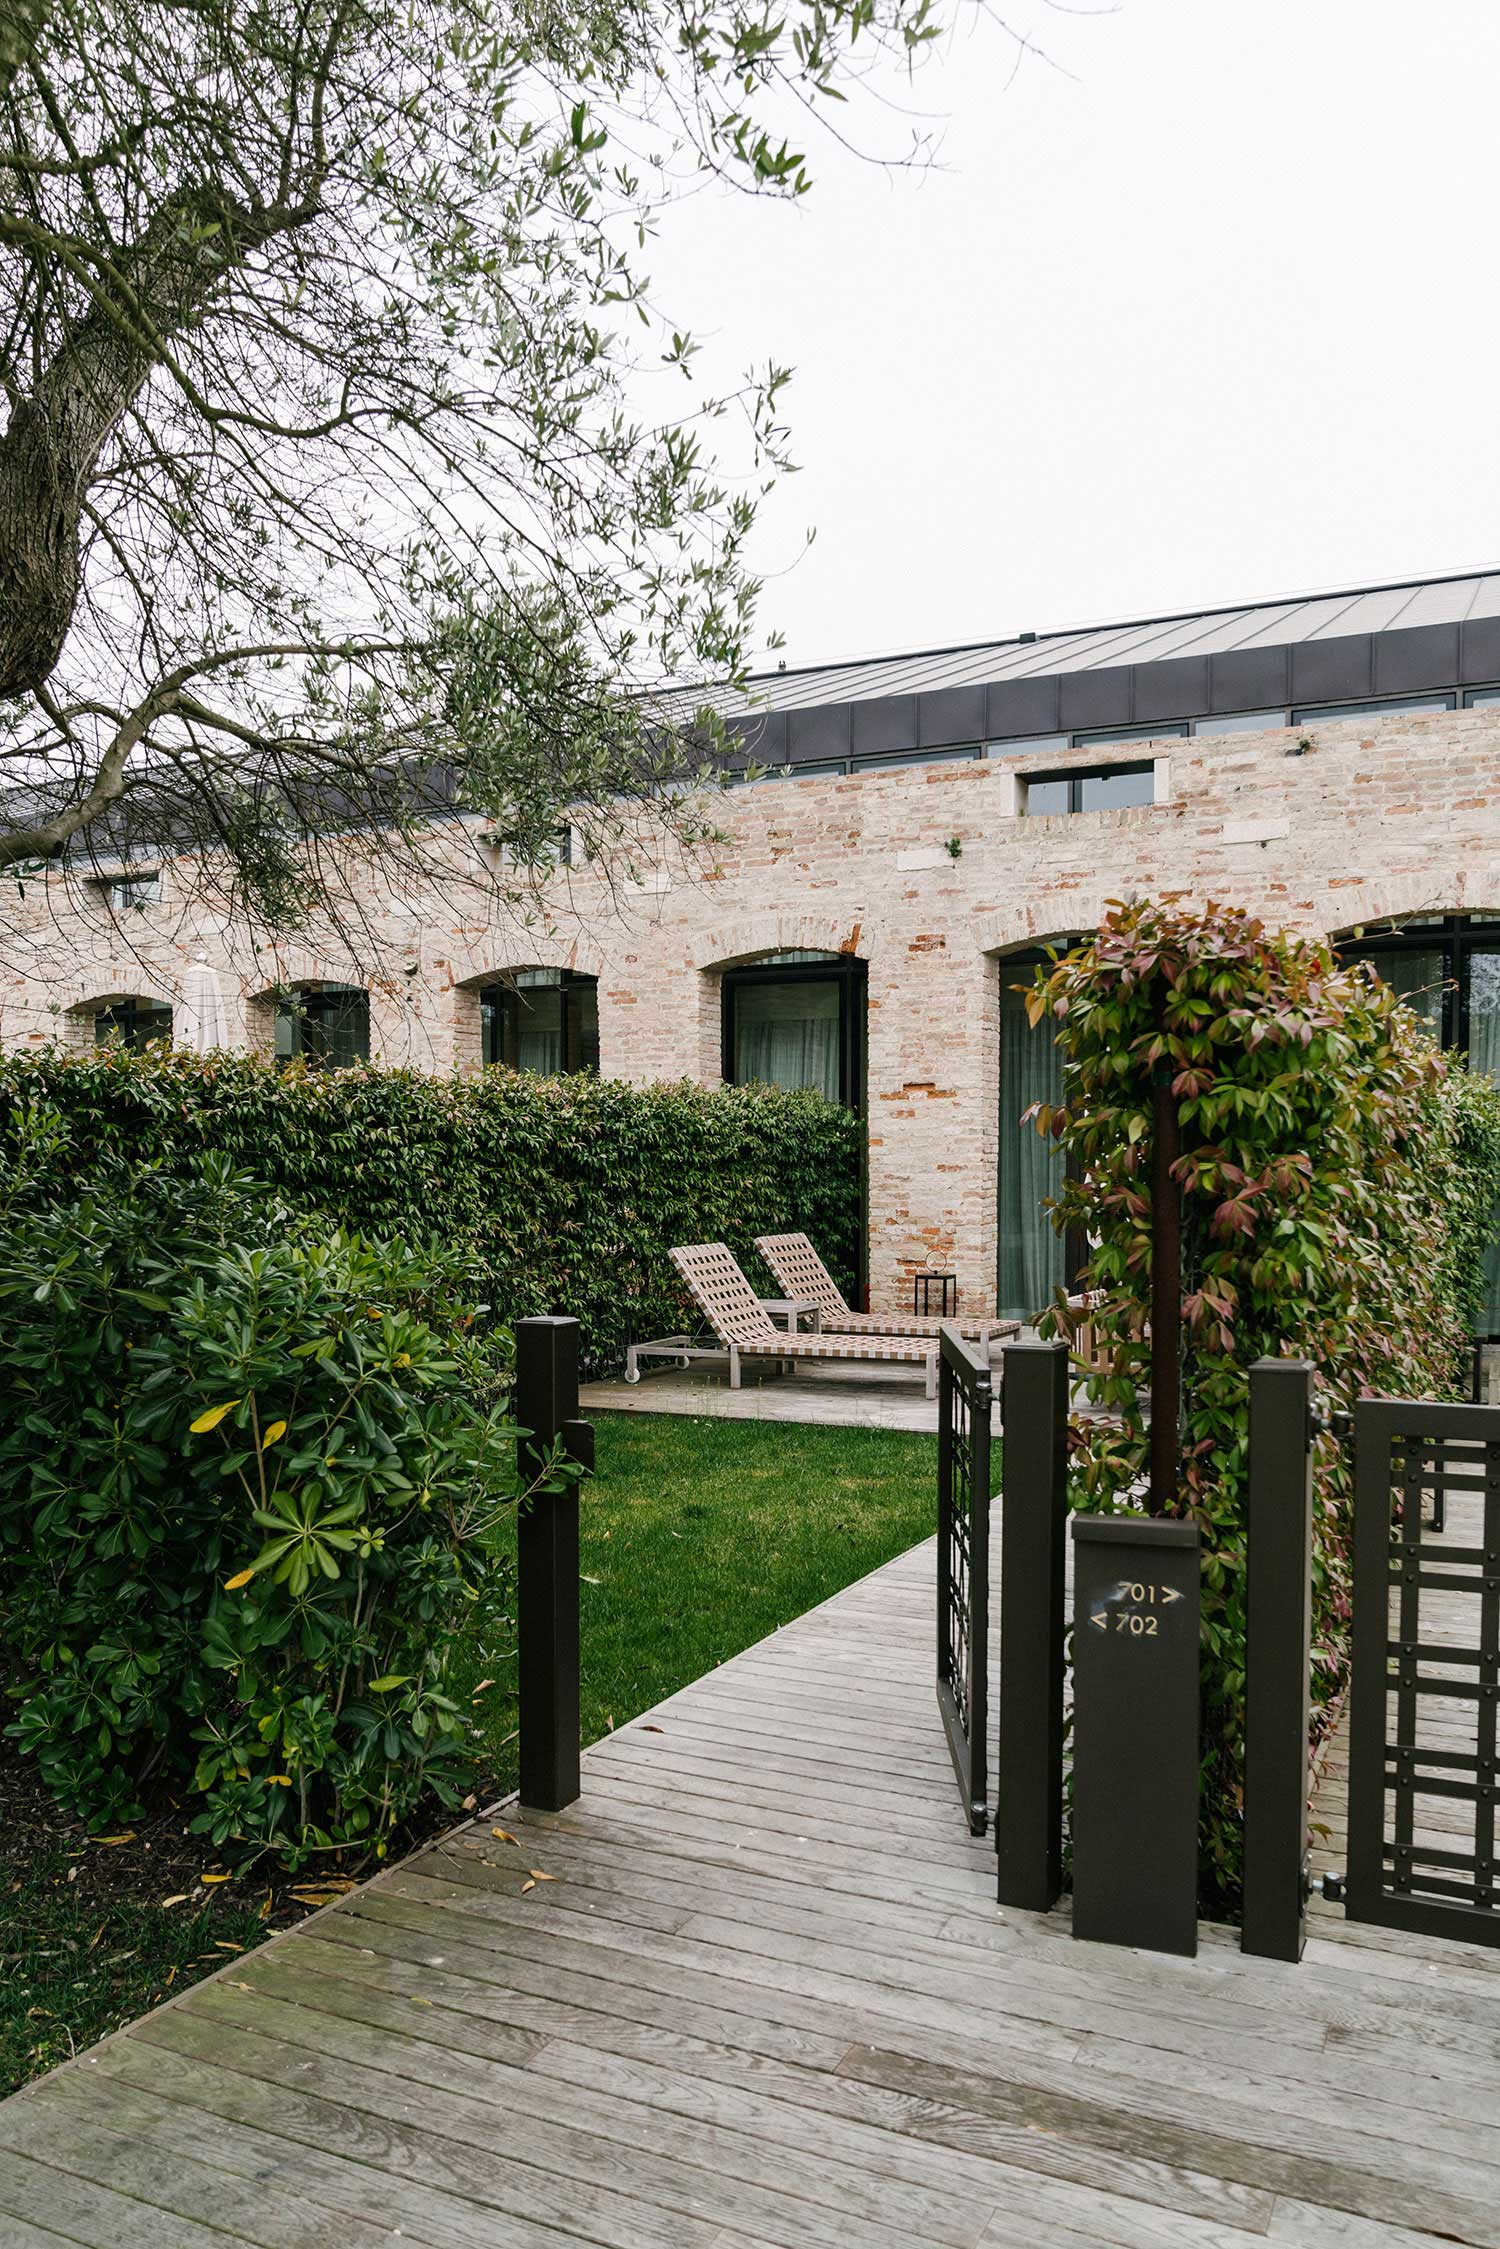 La Maisonette  lofts, a reinterpretation of an old brick building from the beginning of the 20th century